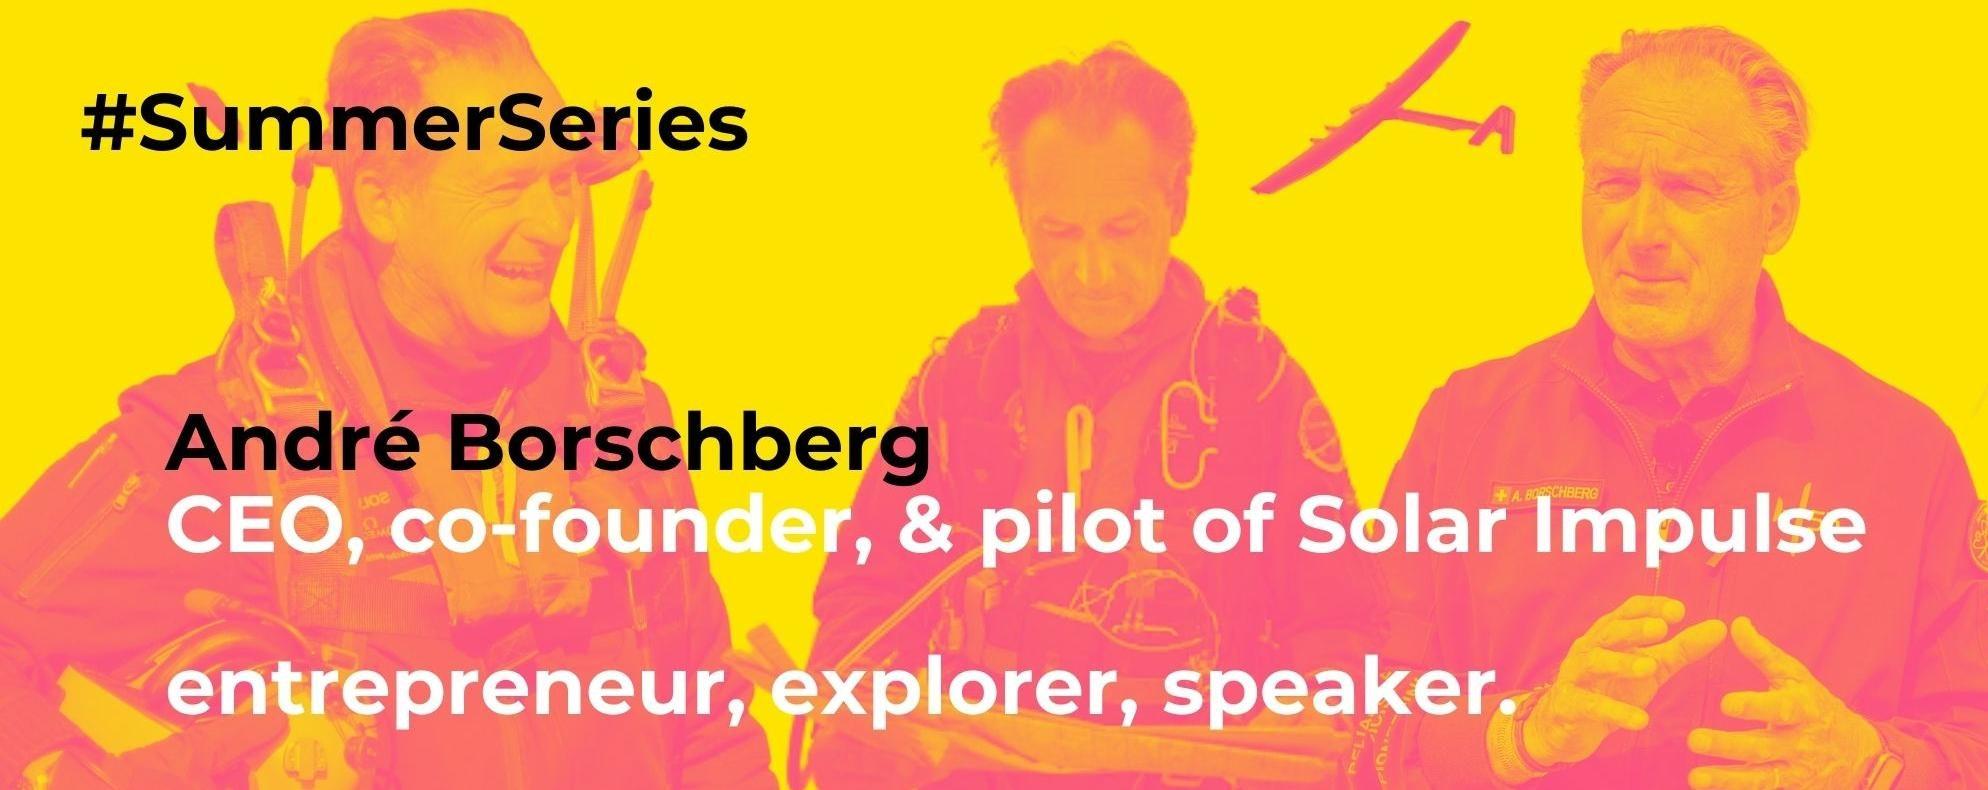 #SummerSeries: 5 questions for André Borschberg—entrepreneur, explorer, speaker